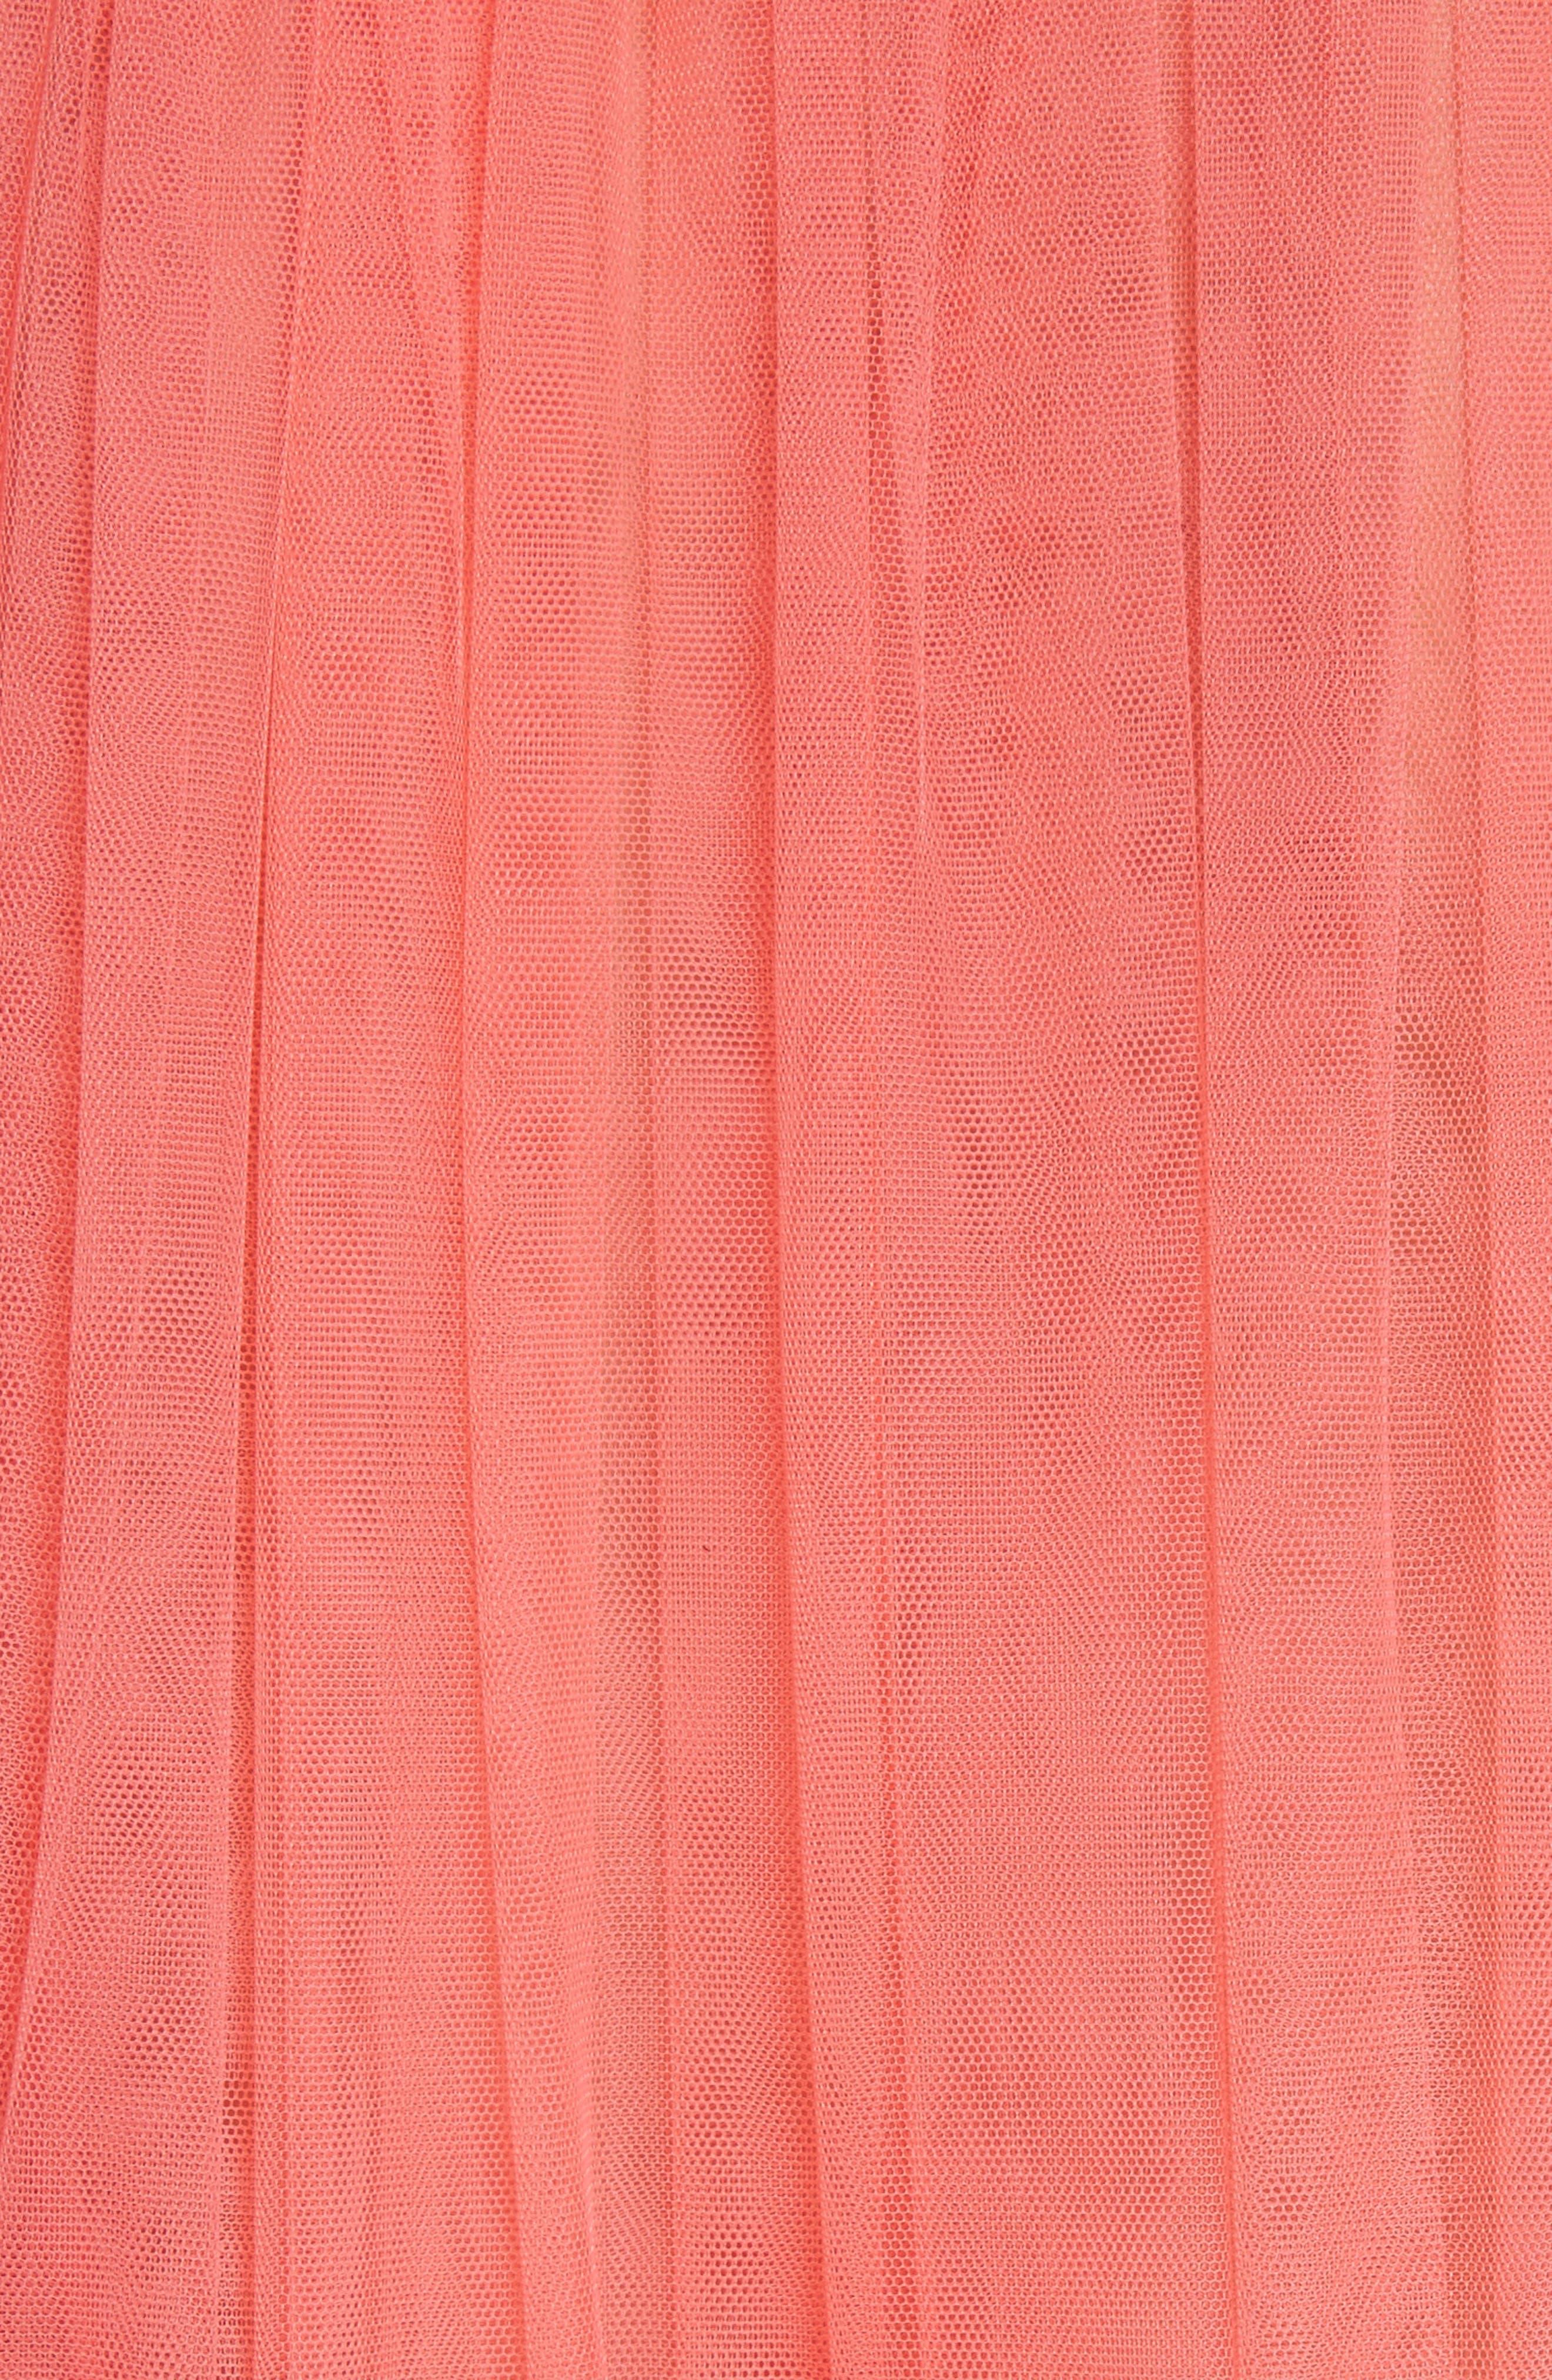 Doris Embroidered Tulle Dress,                             Alternate thumbnail 6, color,                             950